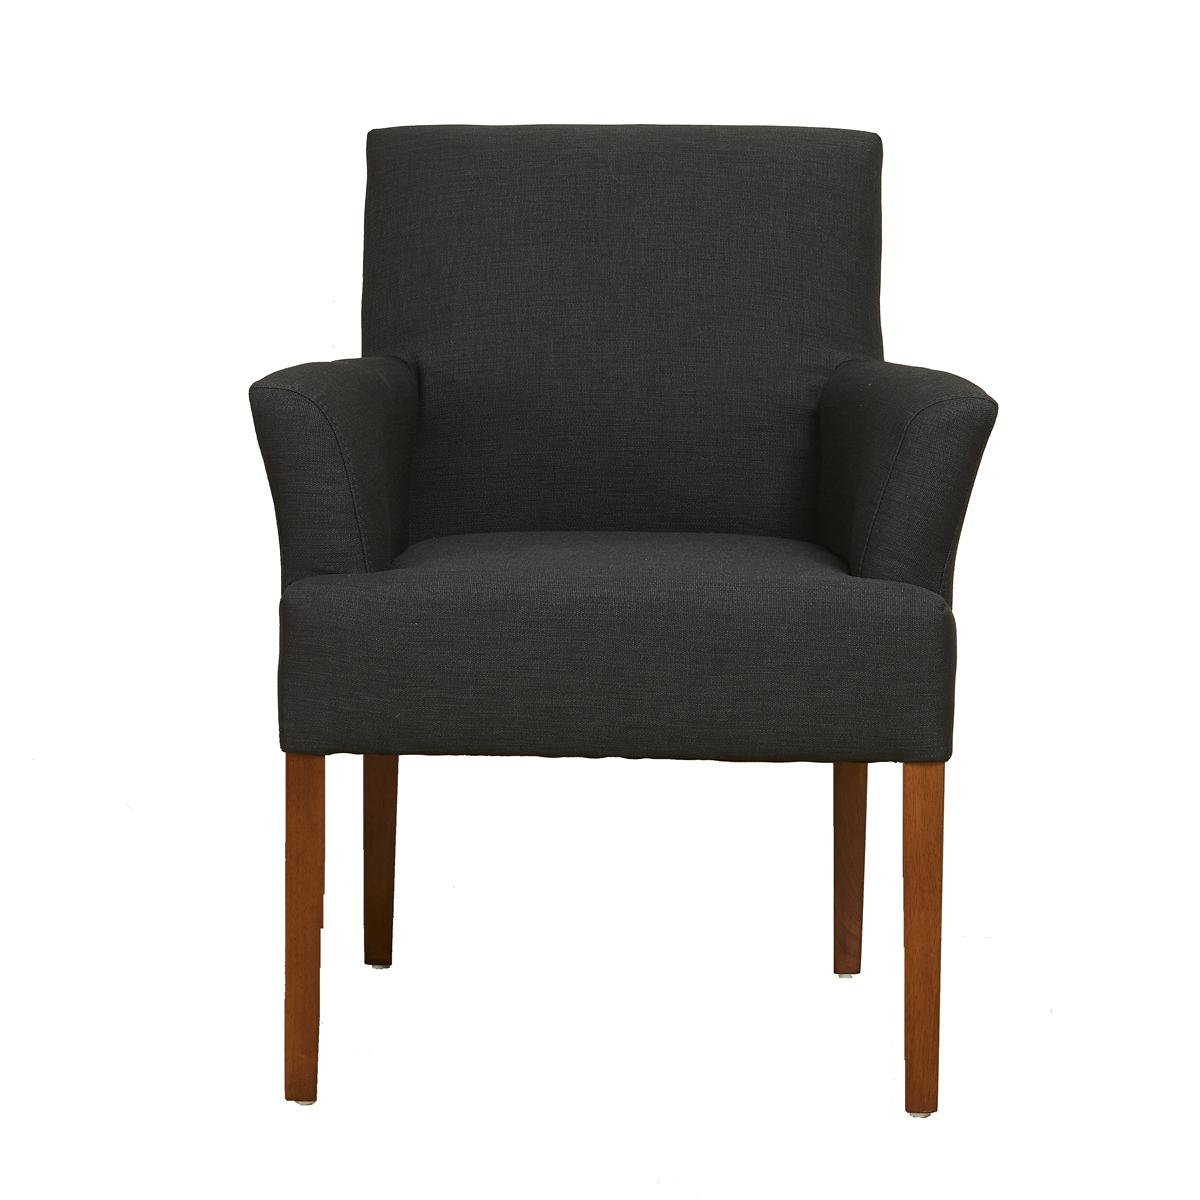 Coffee Table Dimensions Arizona Charcoal Armchair